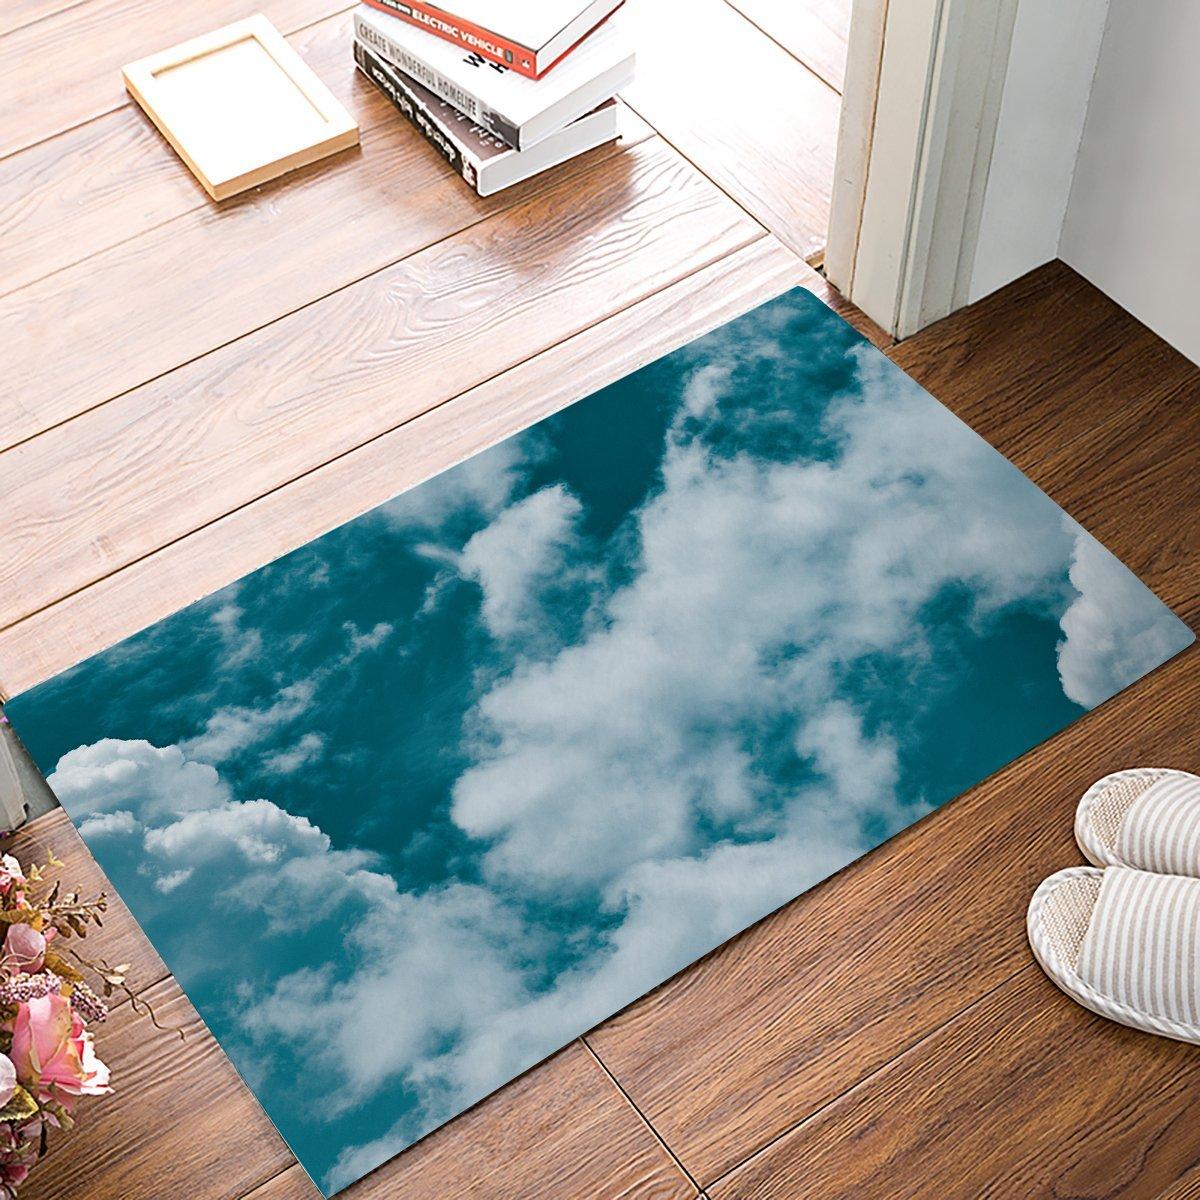 Blue Kitchen Floor Mats: Blue Sky Door Mats Kitchen Floor Bath Entrance Rug Mat